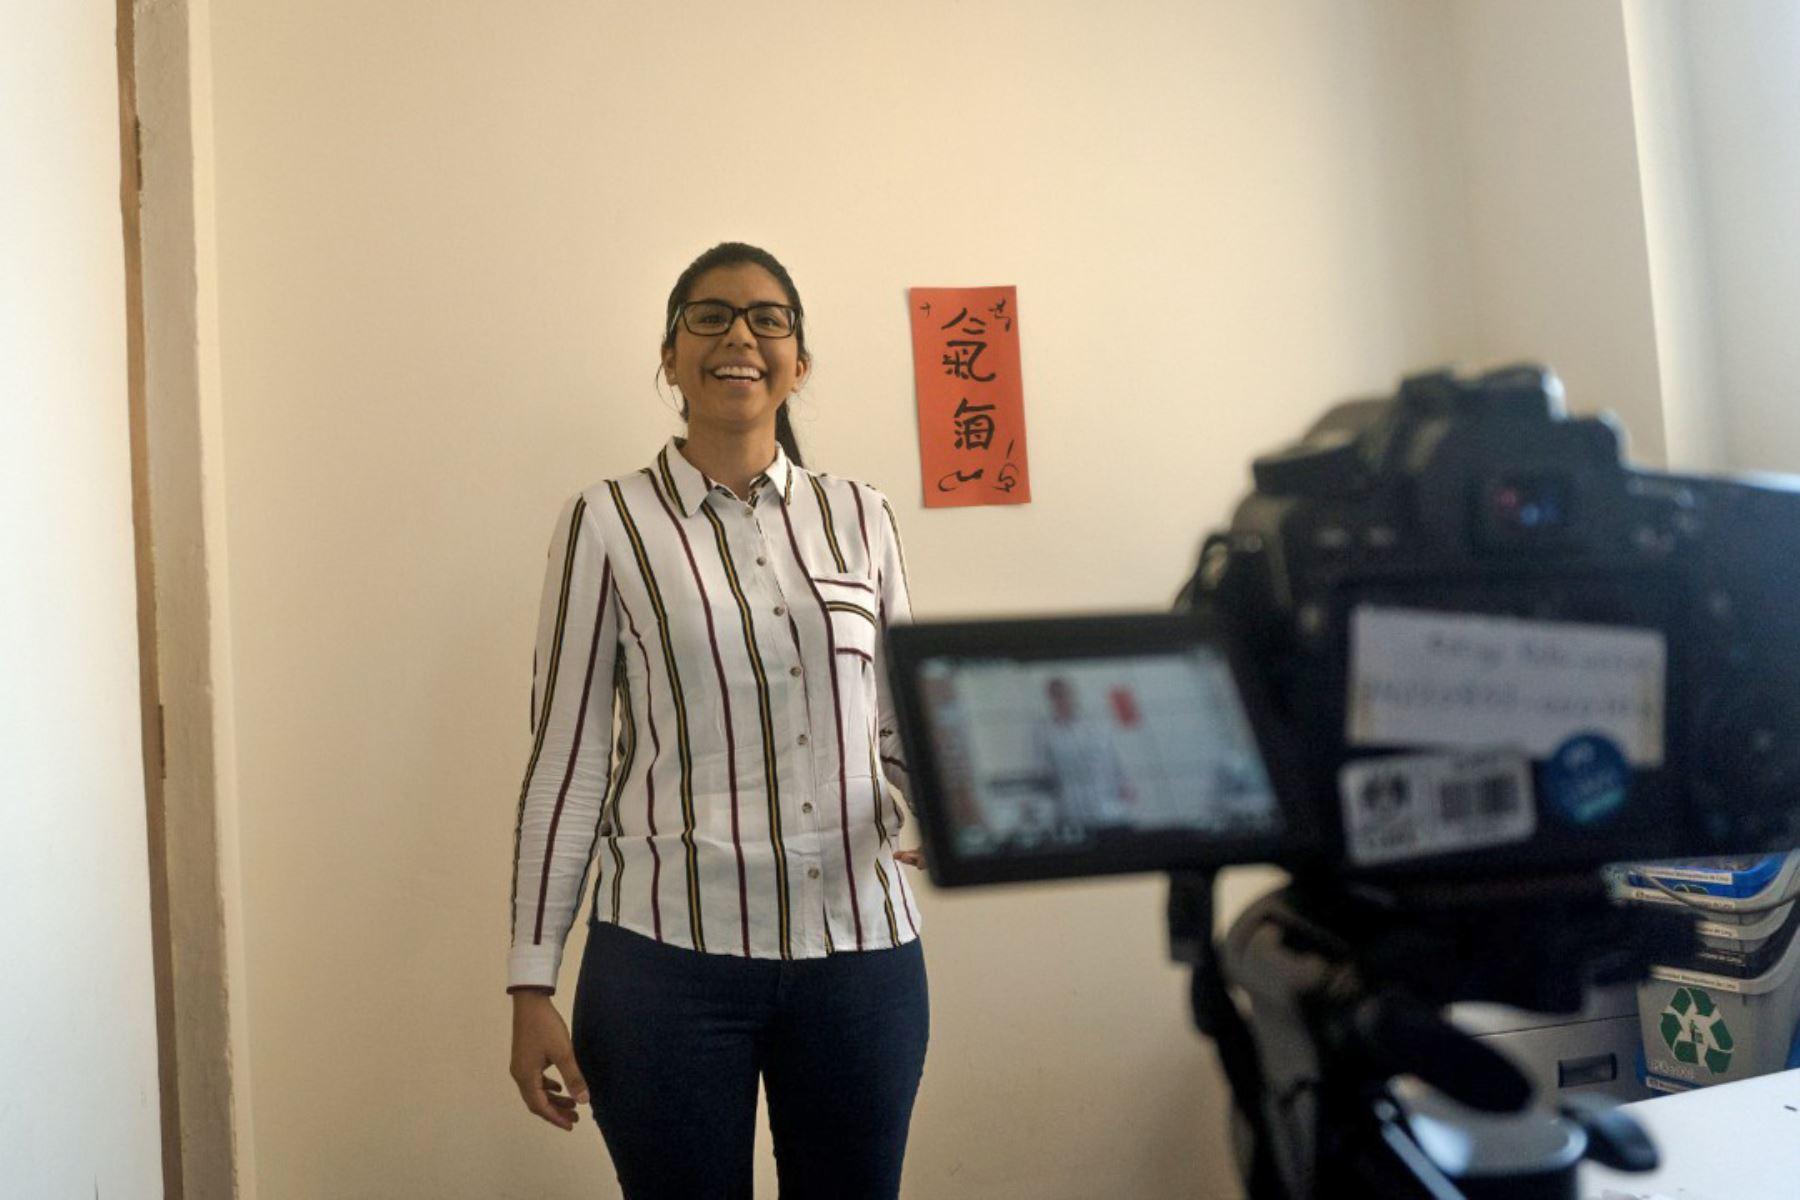 Los participantes deben grabar un video para participar. ANDINA/Difusión